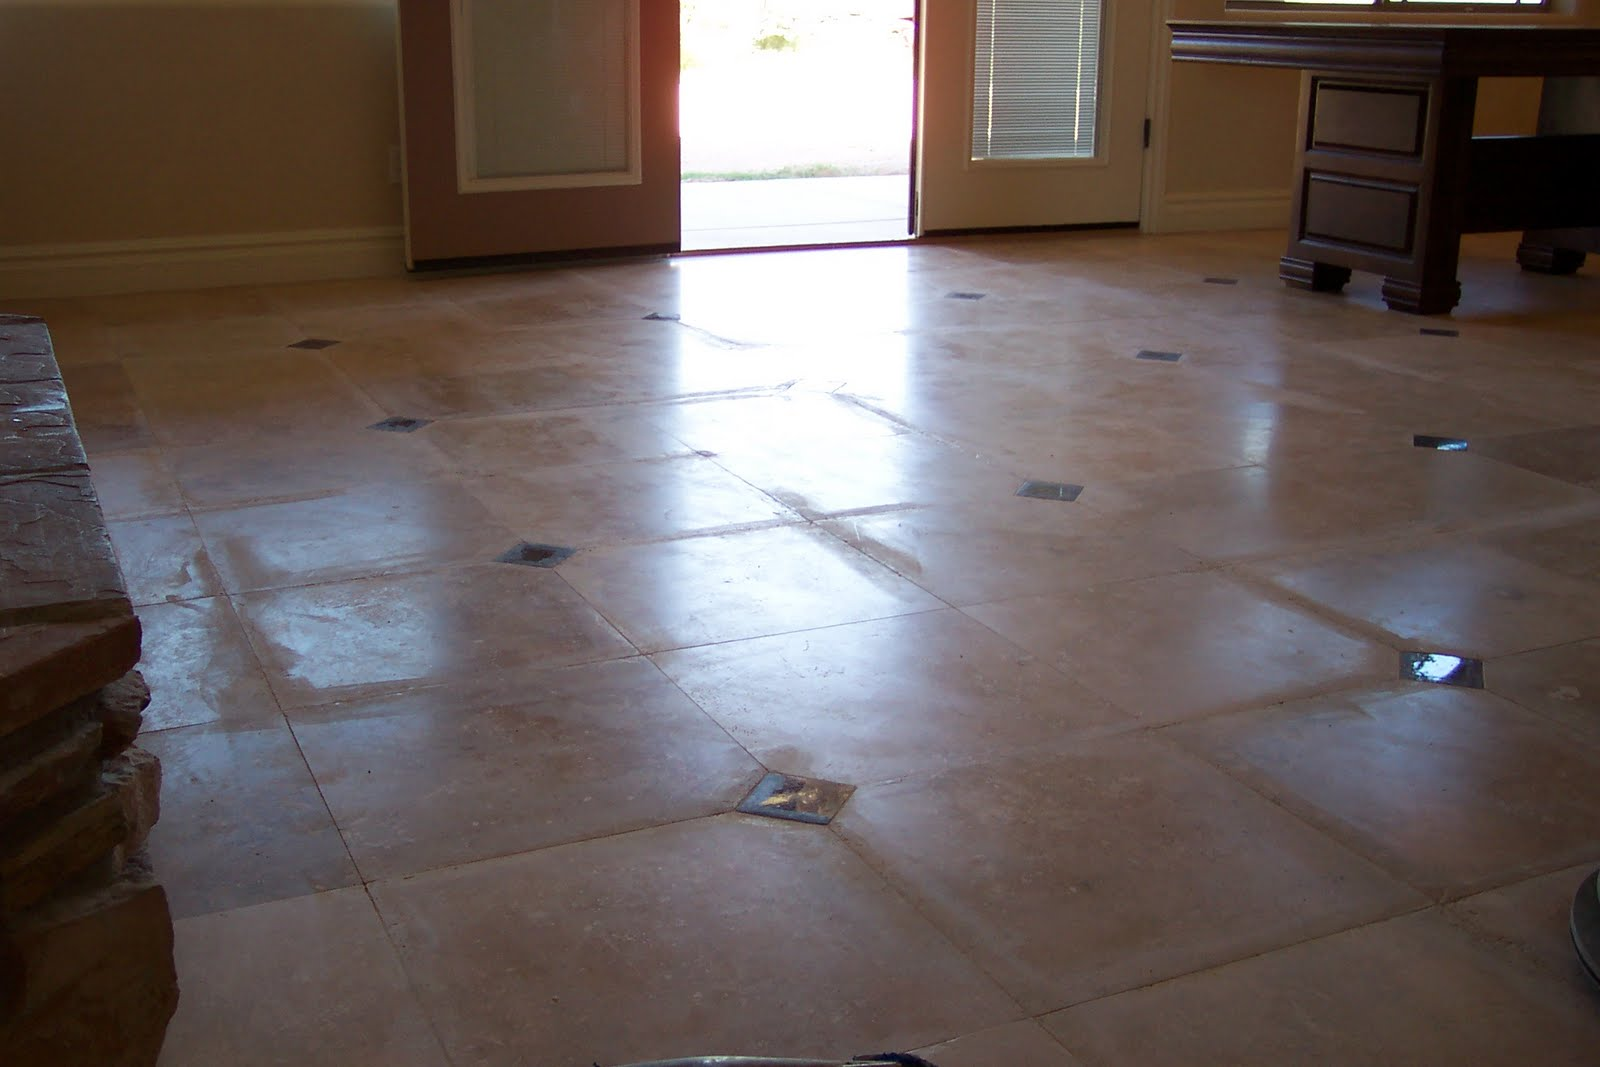 Travertine floor was ground improperly by the installer | Grinding & Lippage | Travertine | Baker's Travertine Power Clean